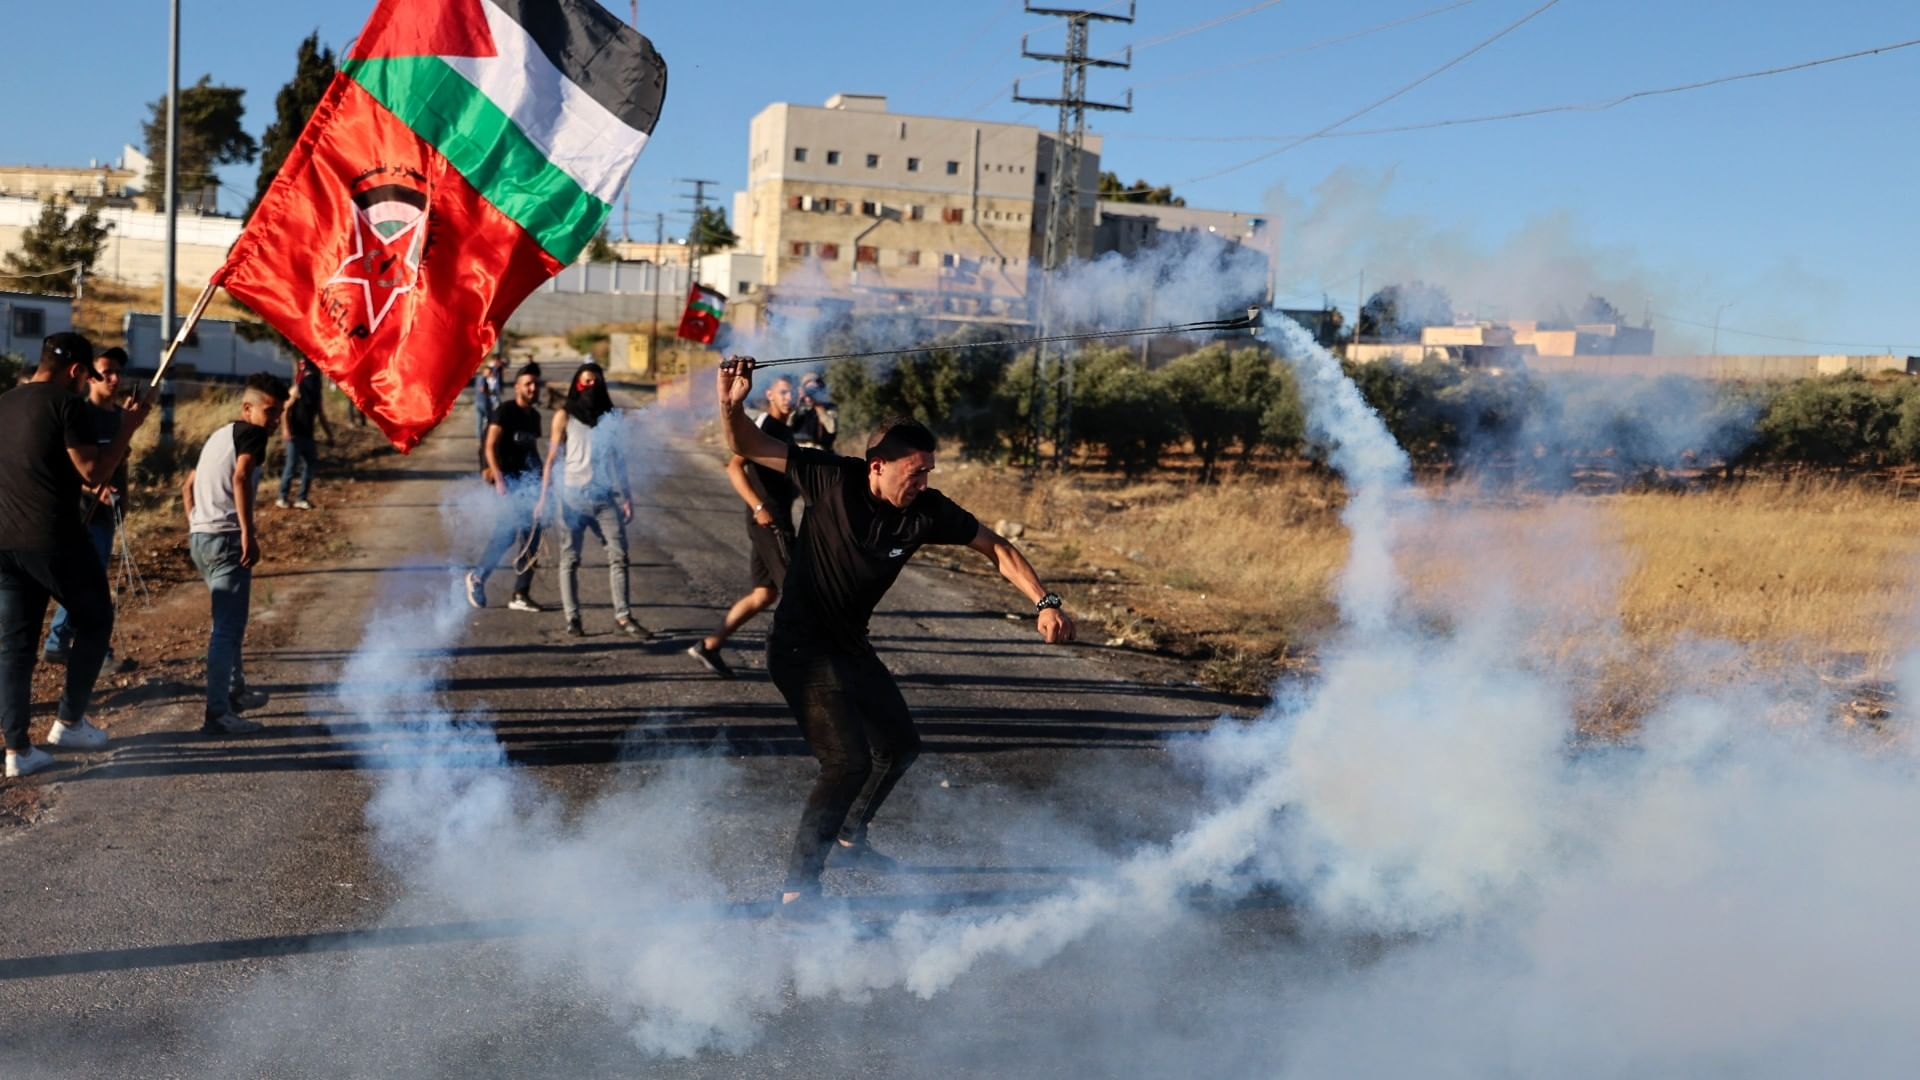 Israel-Palästina: Erneute Gewalteskalationen